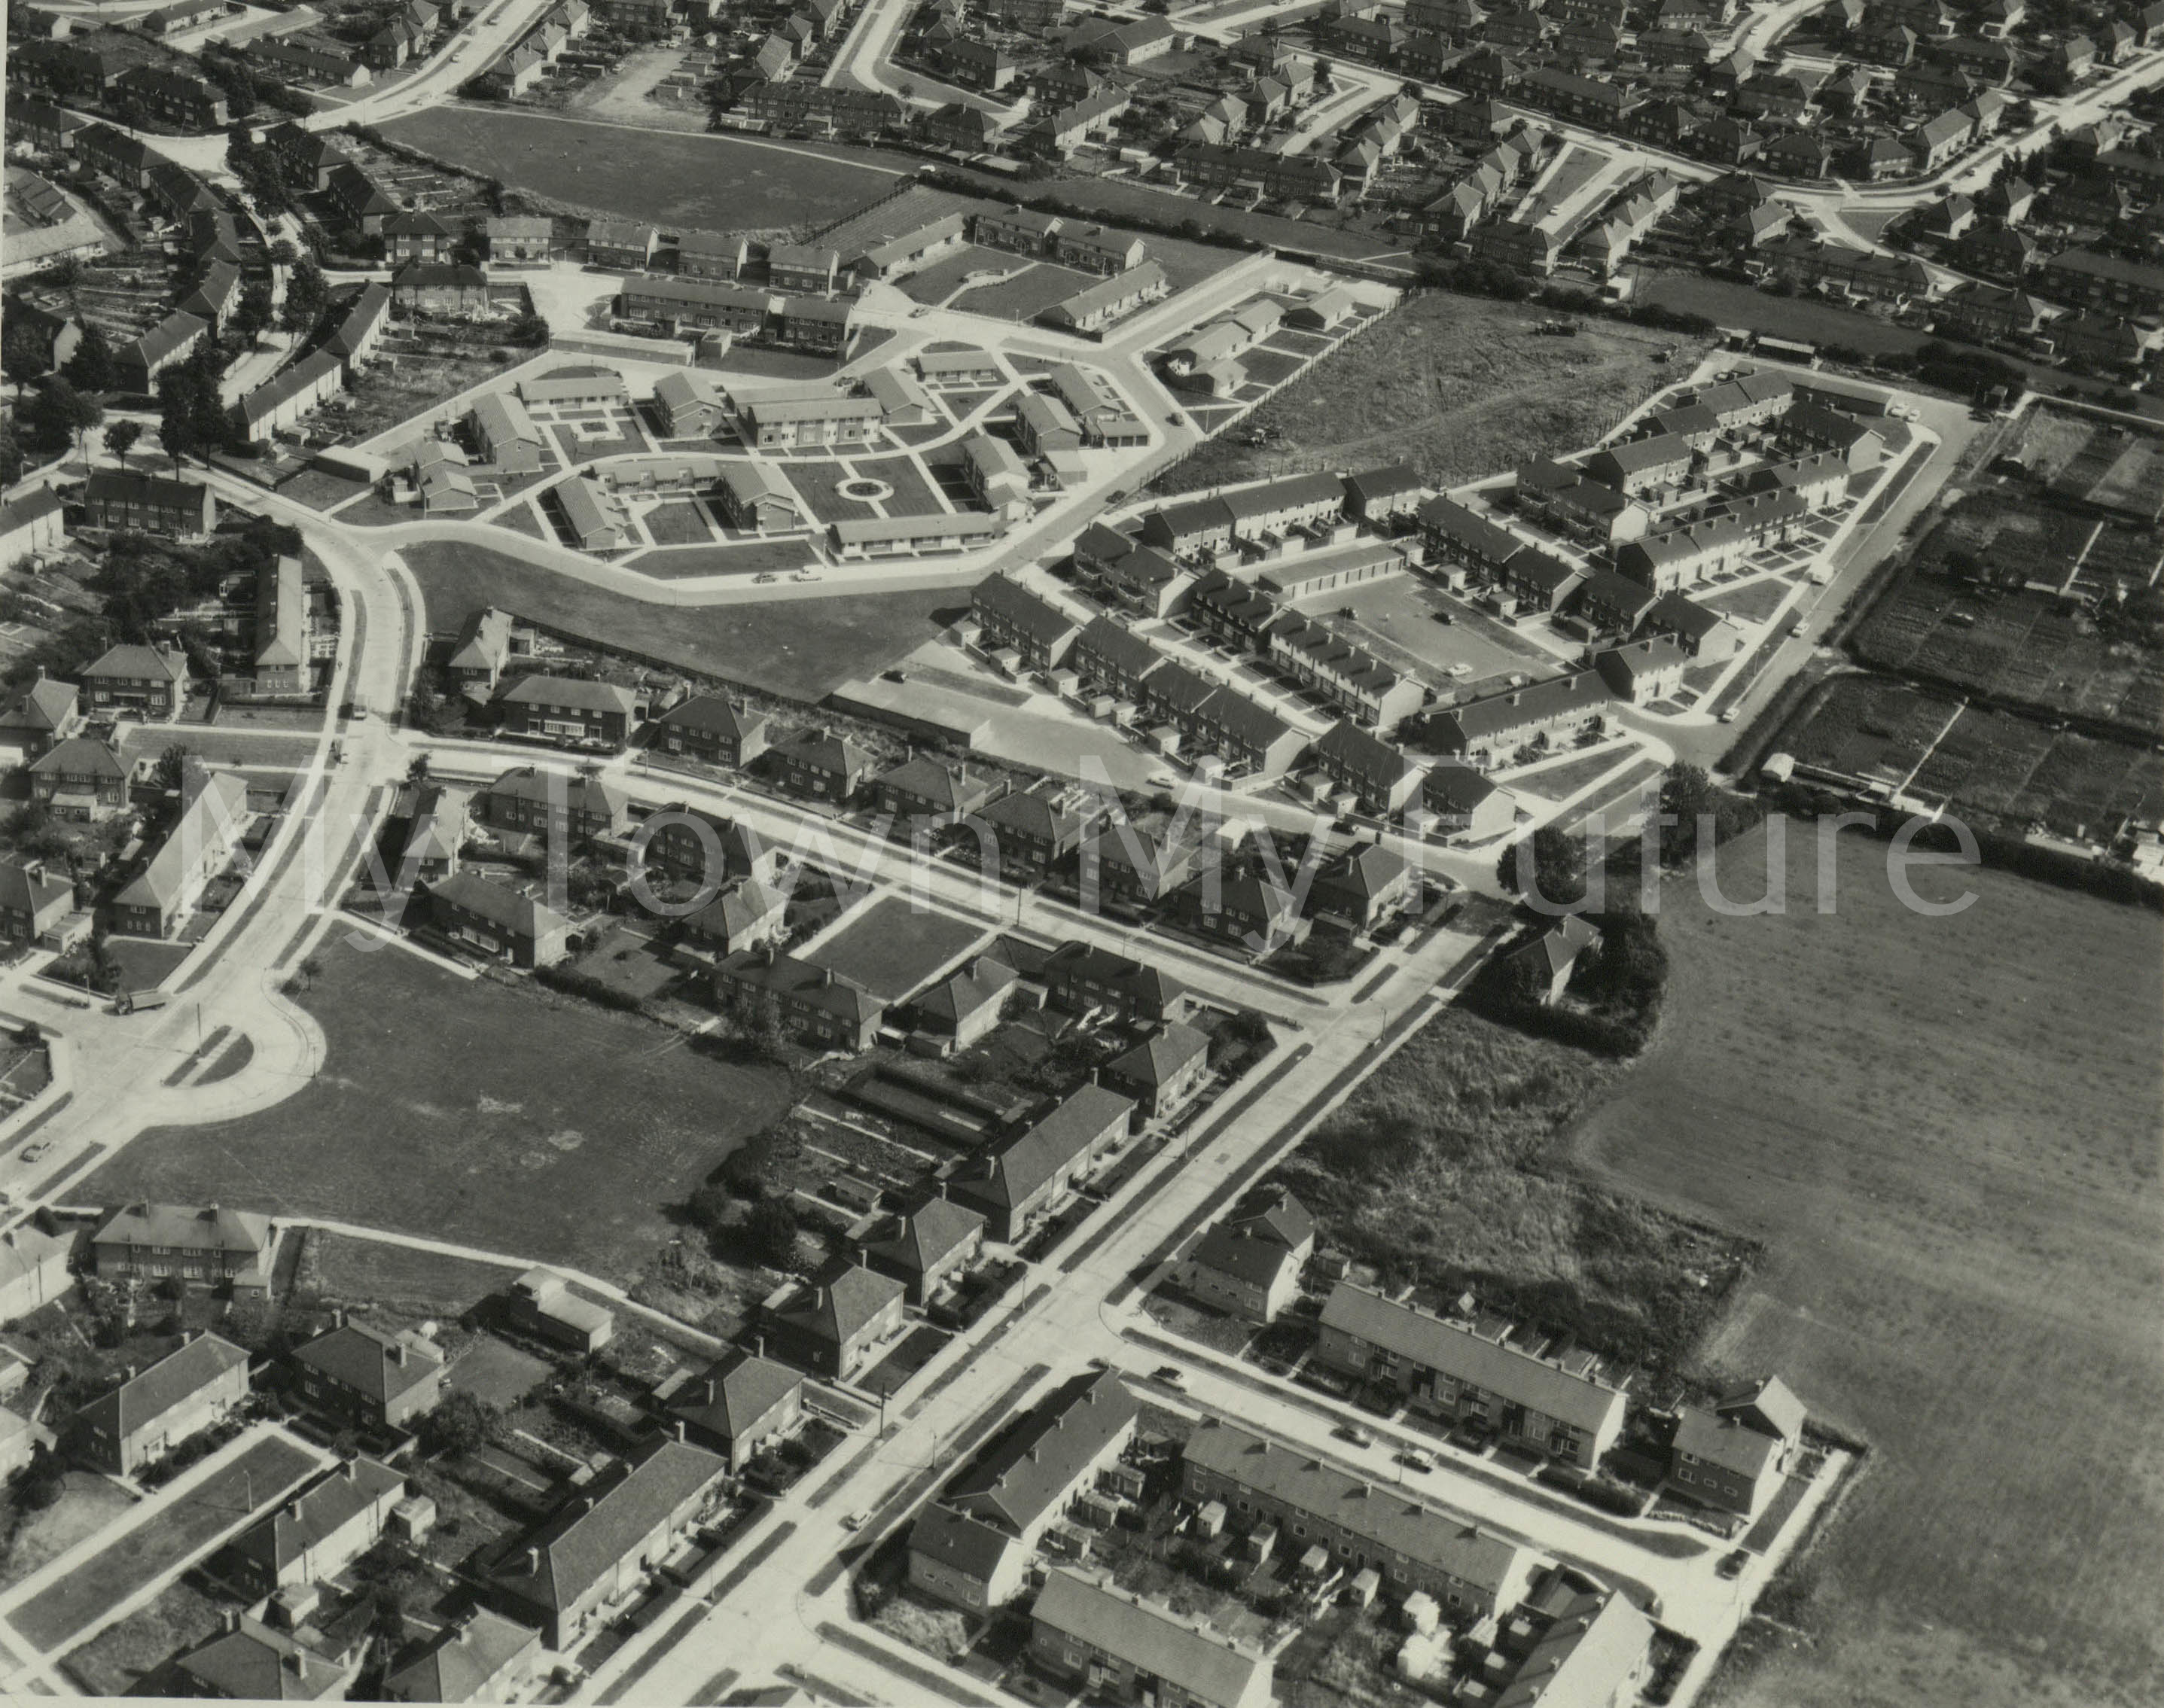 Easterside, Middlesbrough - Aerofilms